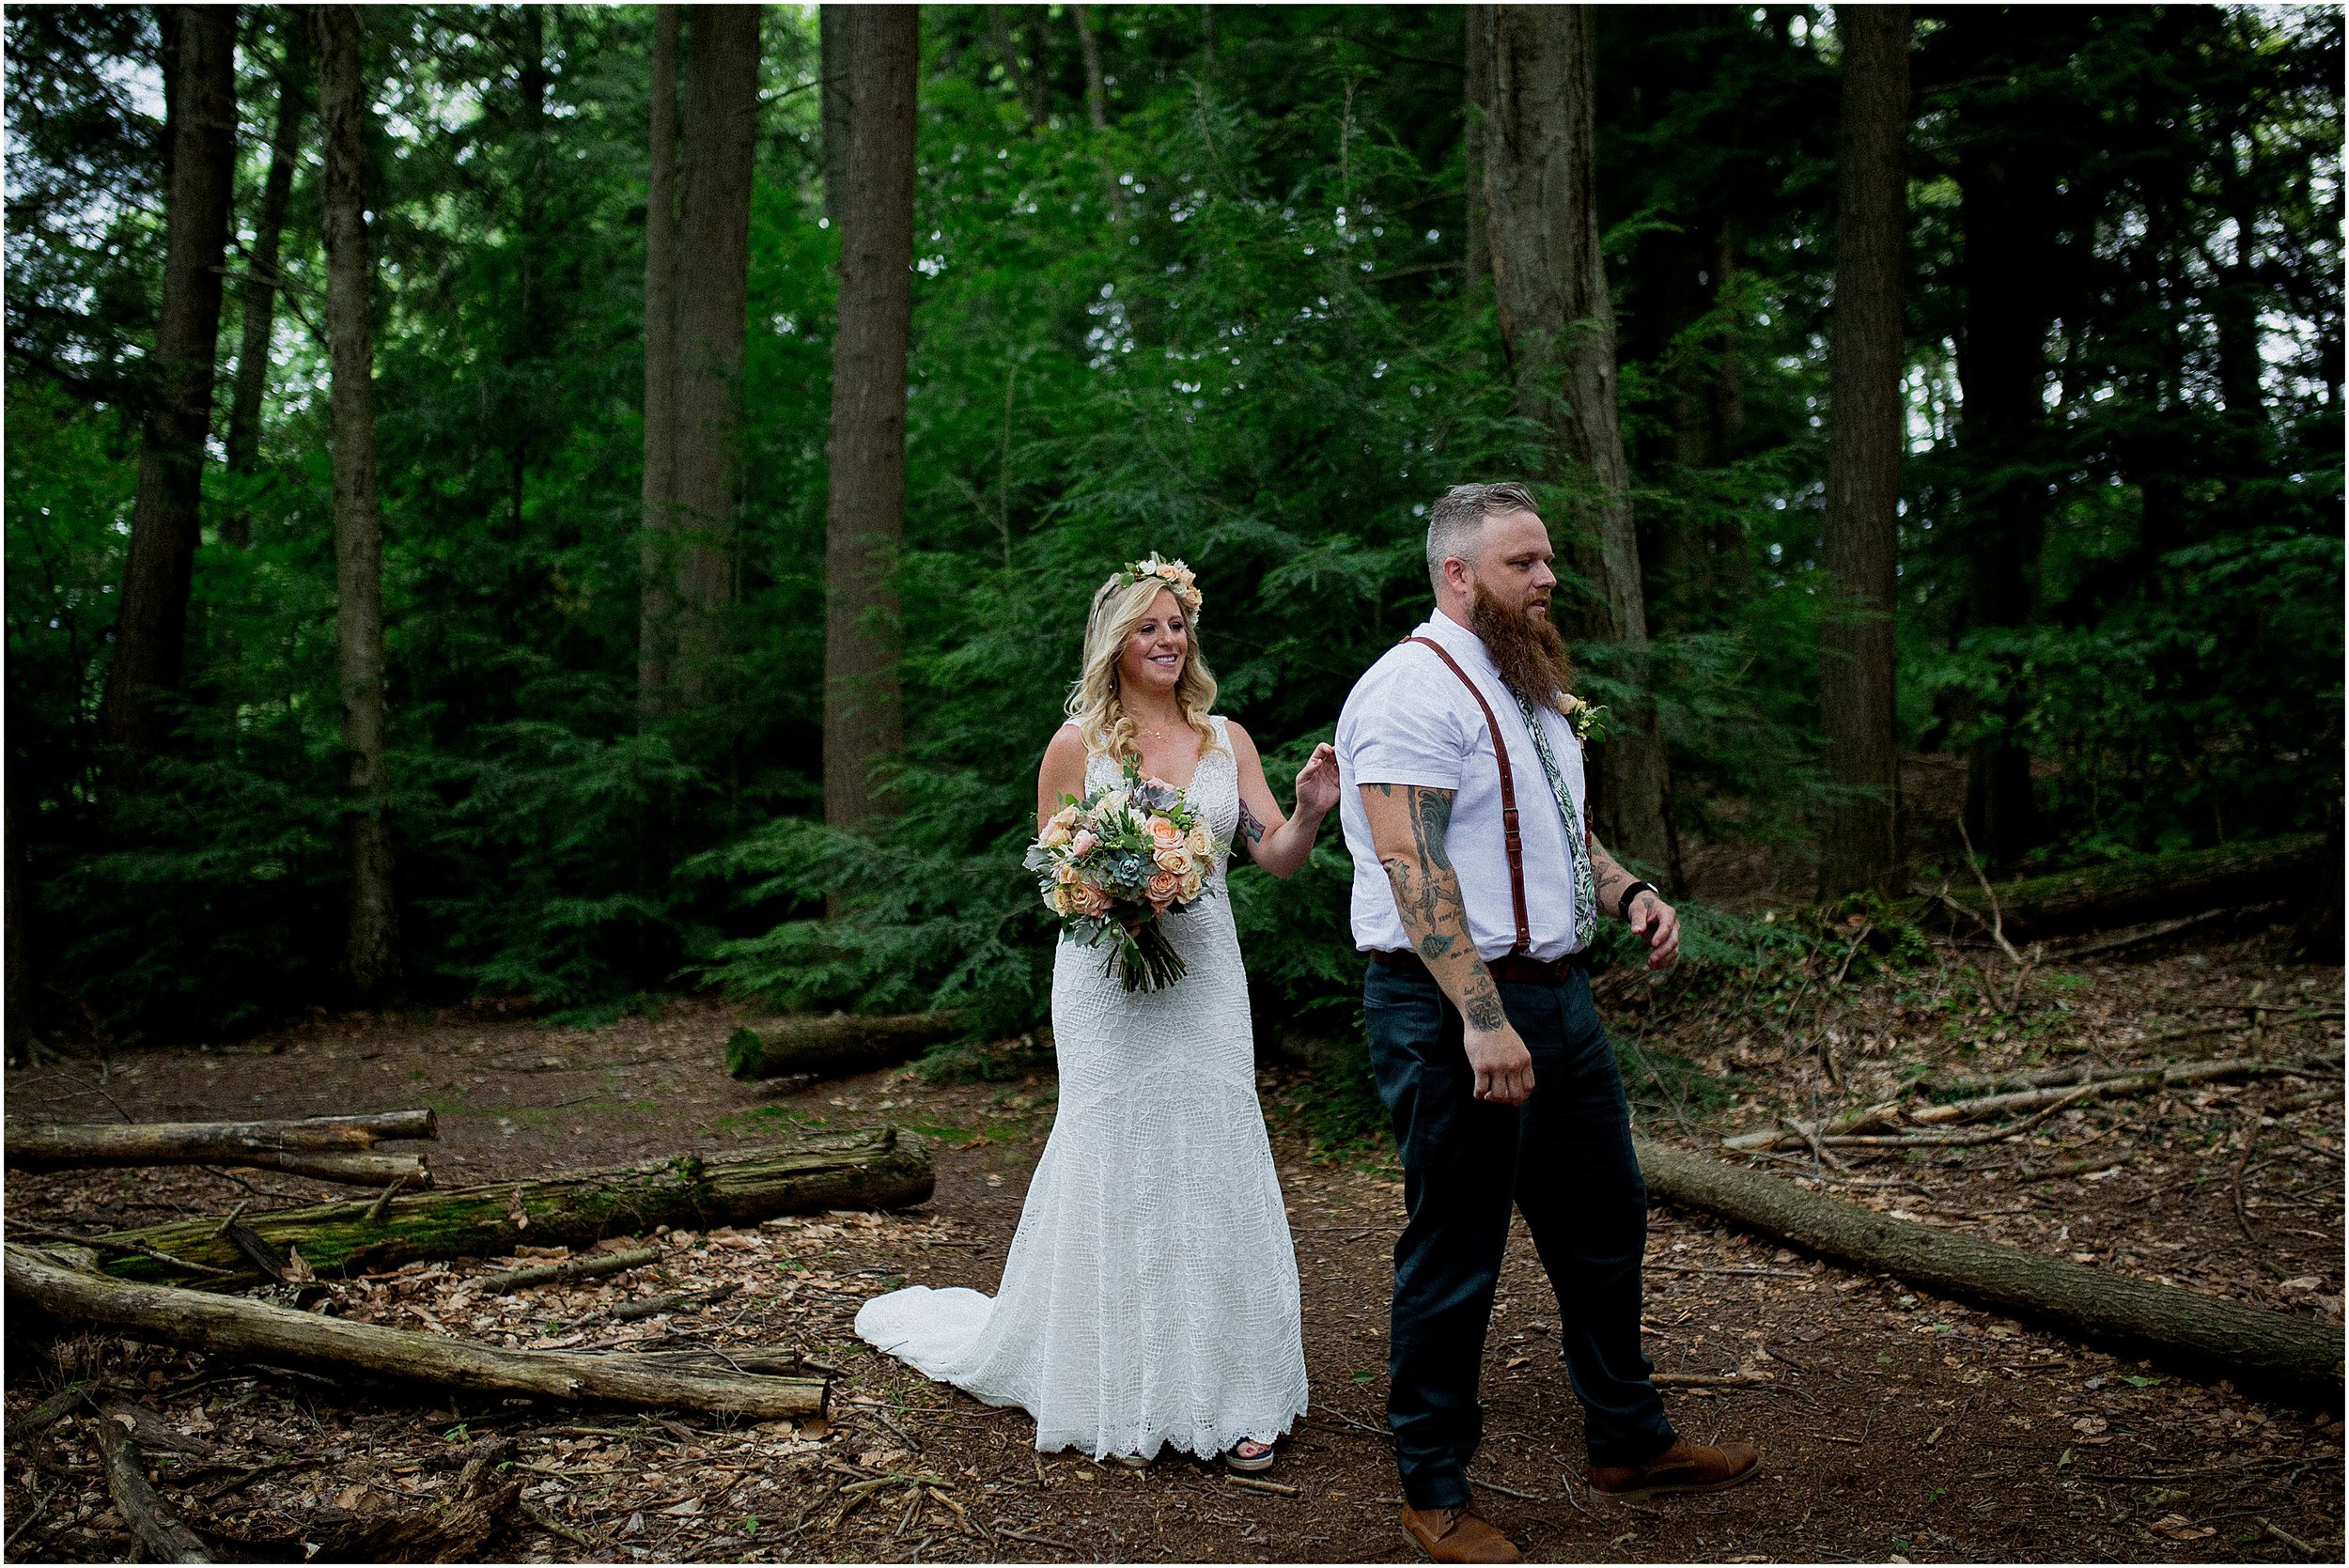 Rose_Valley_Lake_Wedding_Photographer_0031.jpg